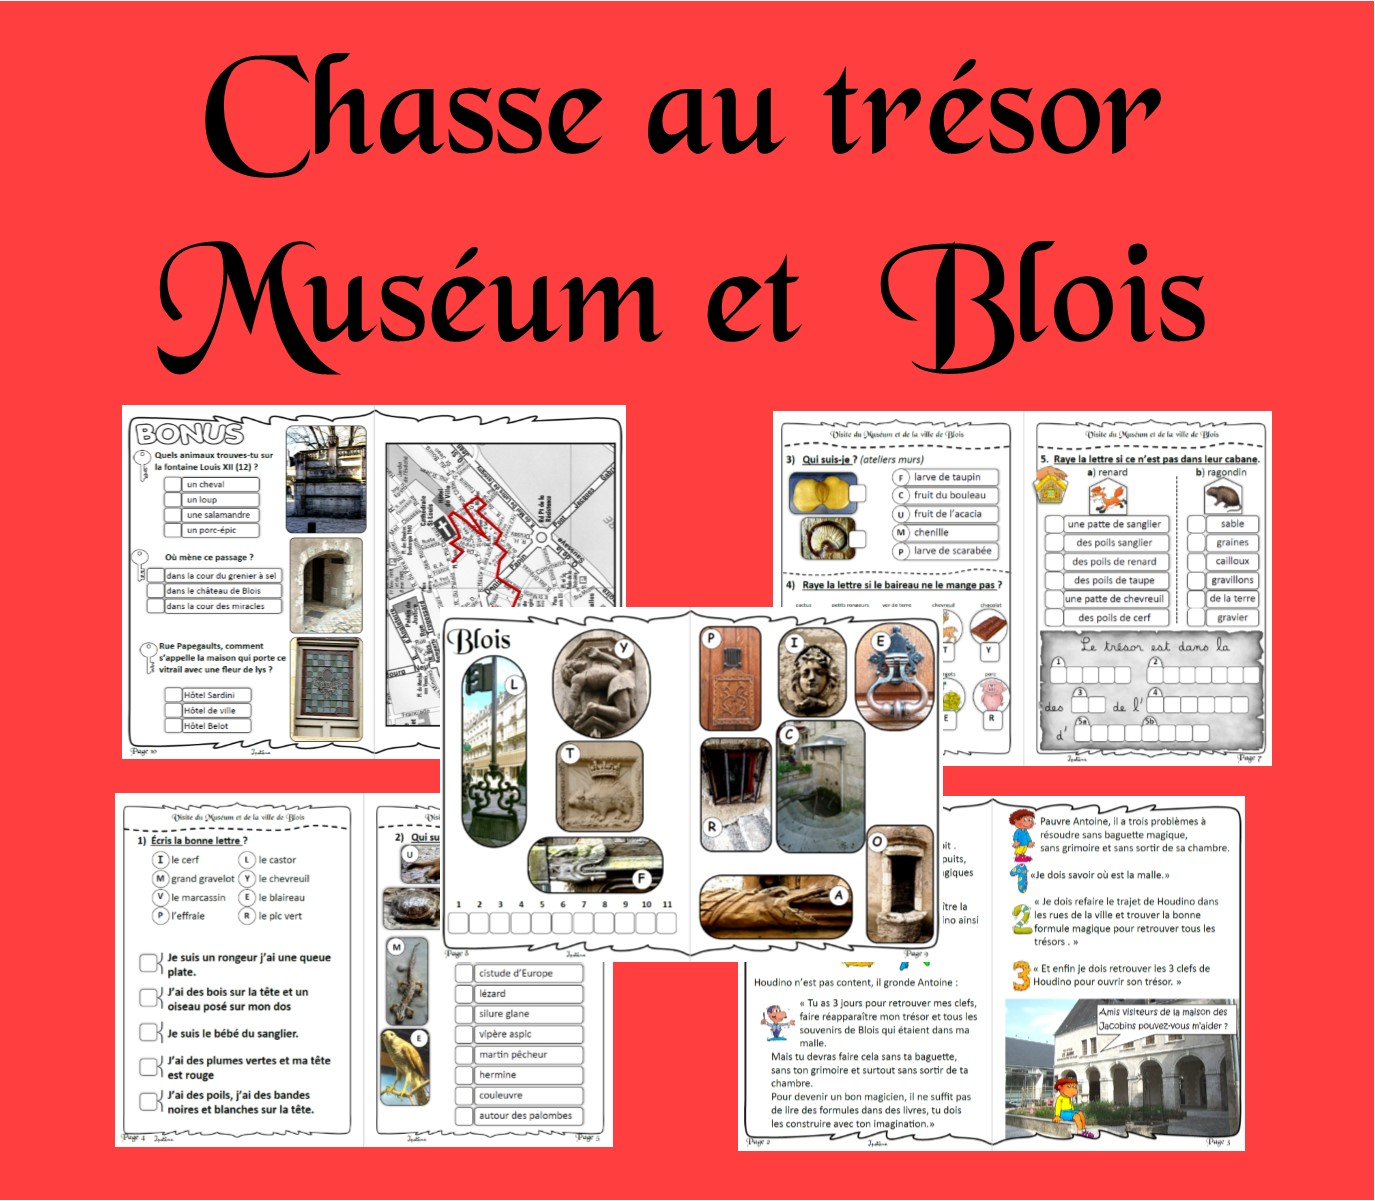 Cr Ef Bf Bder Une Chasse Au Tr Ef Bf Bdsor Guide Complet Indices Comment Organiser Une Chasse Au Tresor Pour Mes Enfants